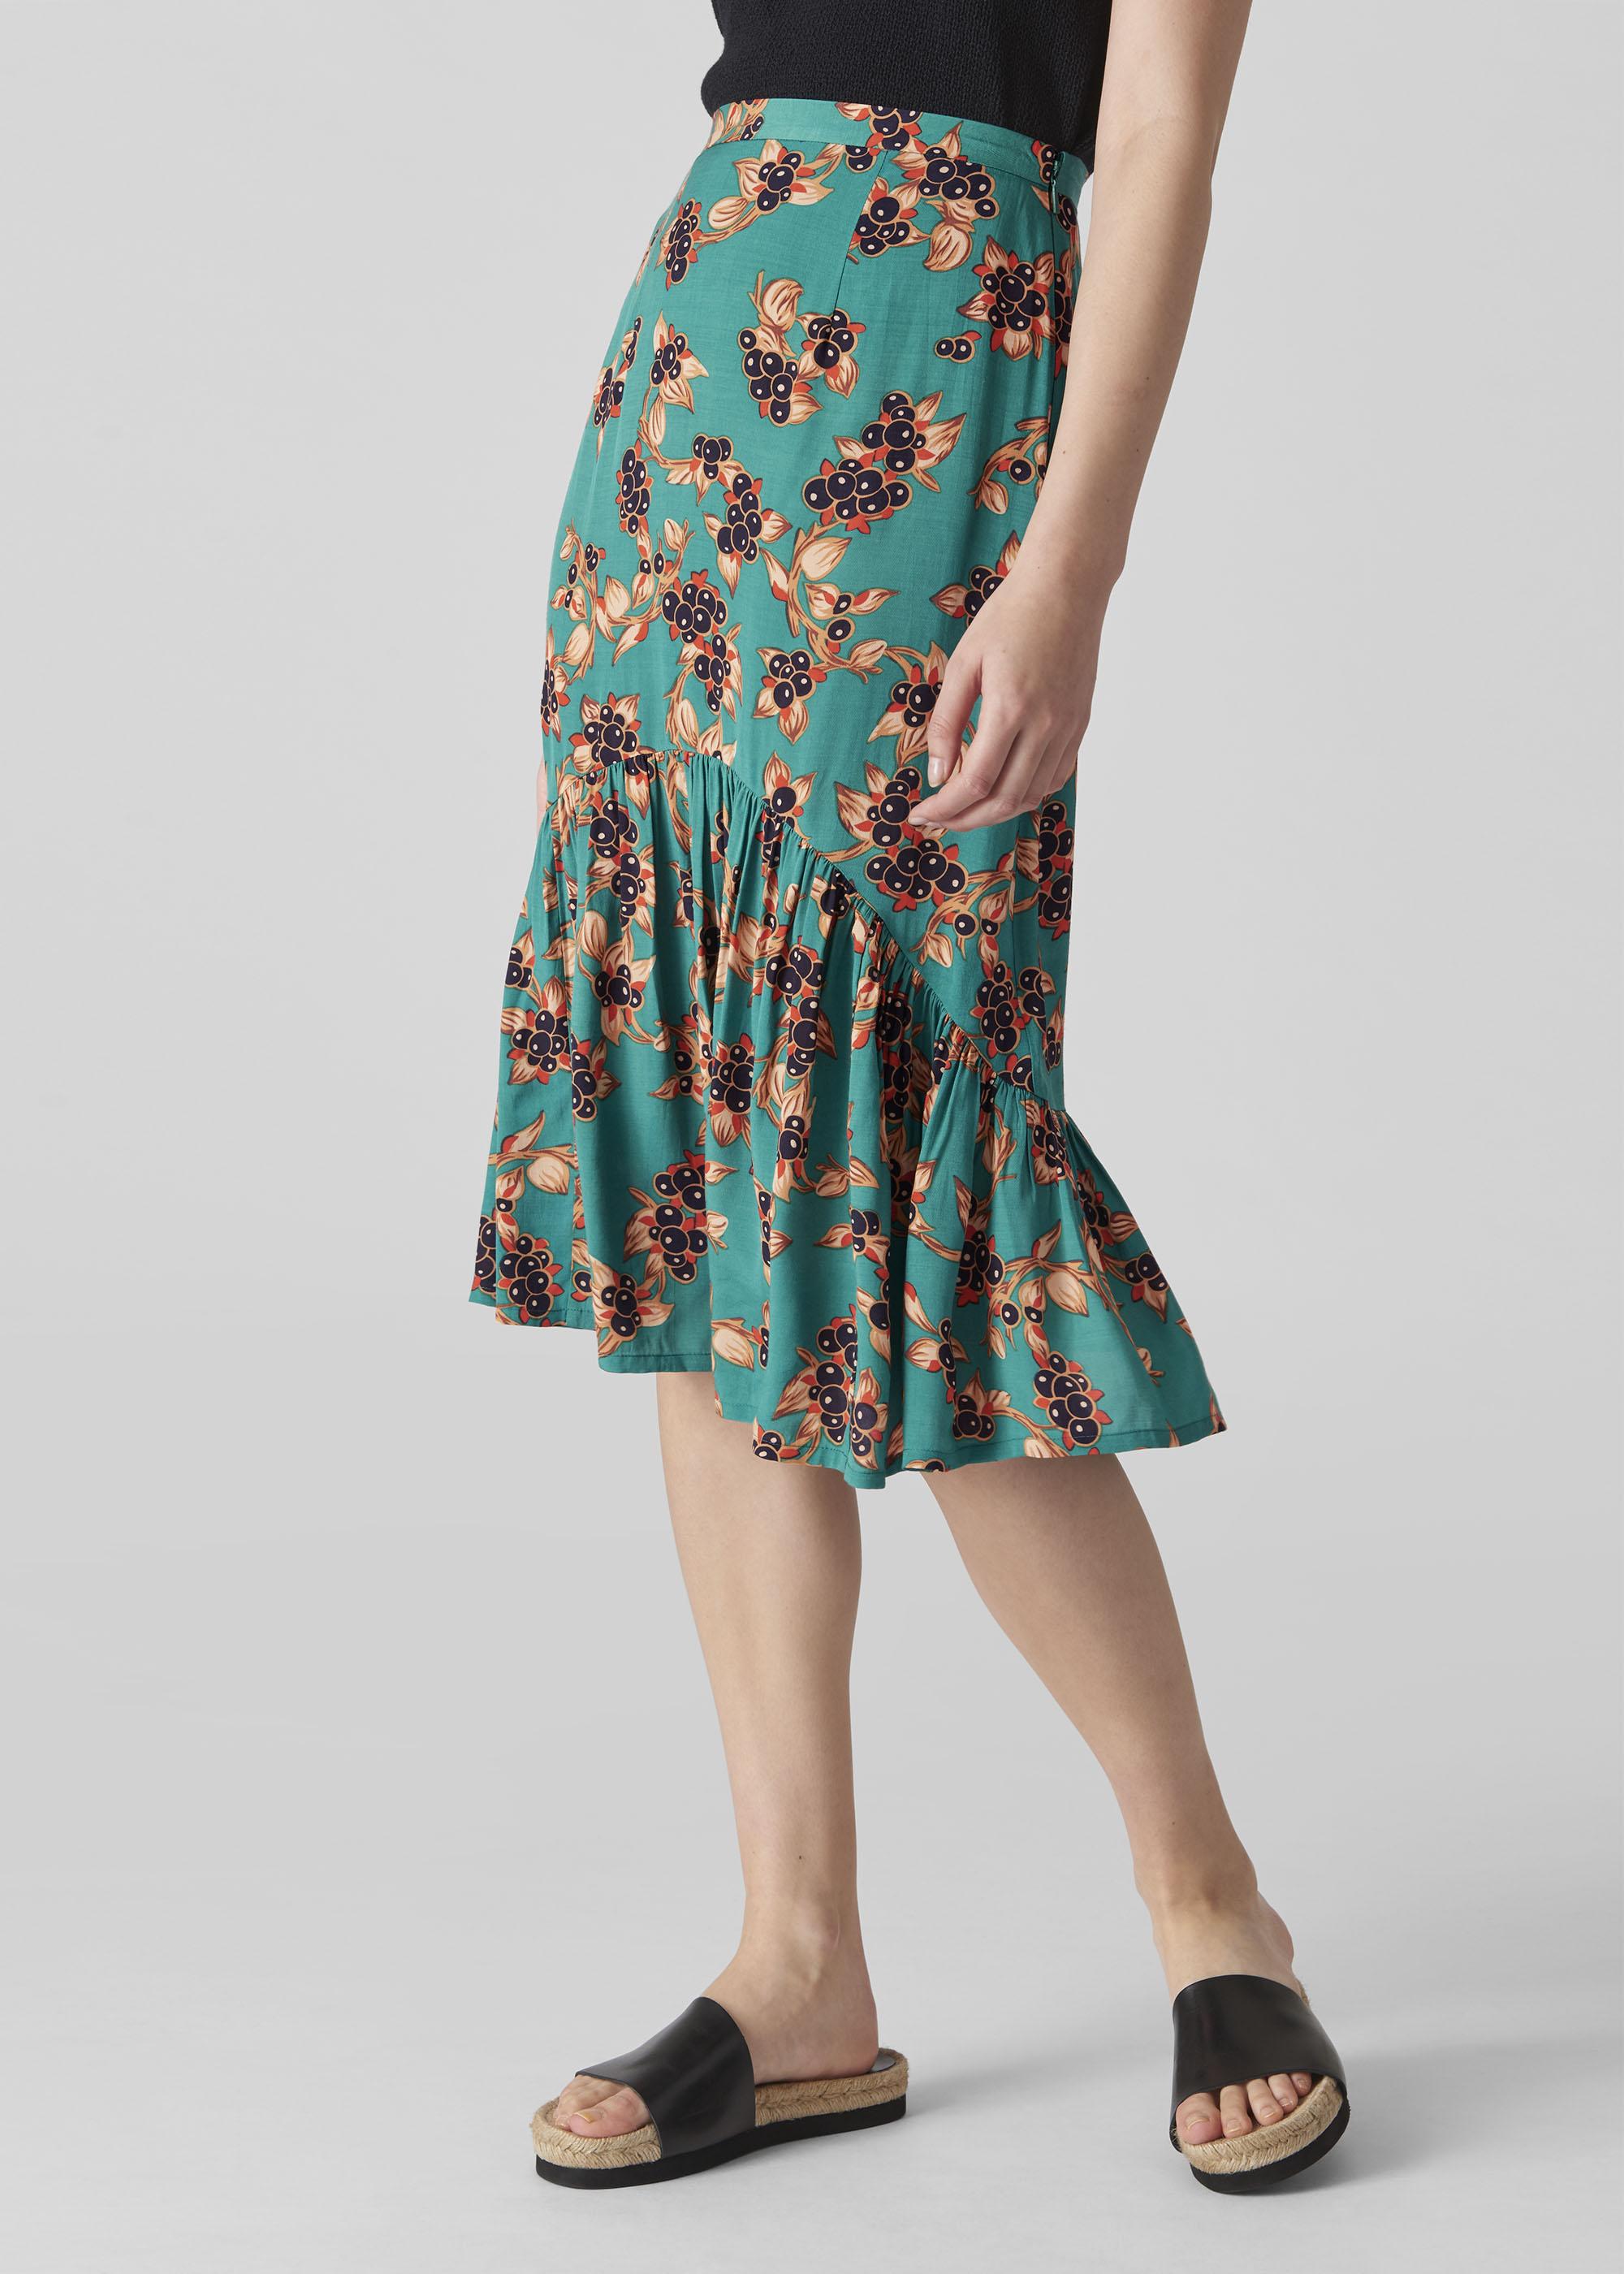 Whistles Women Capri Print Aida Skirt